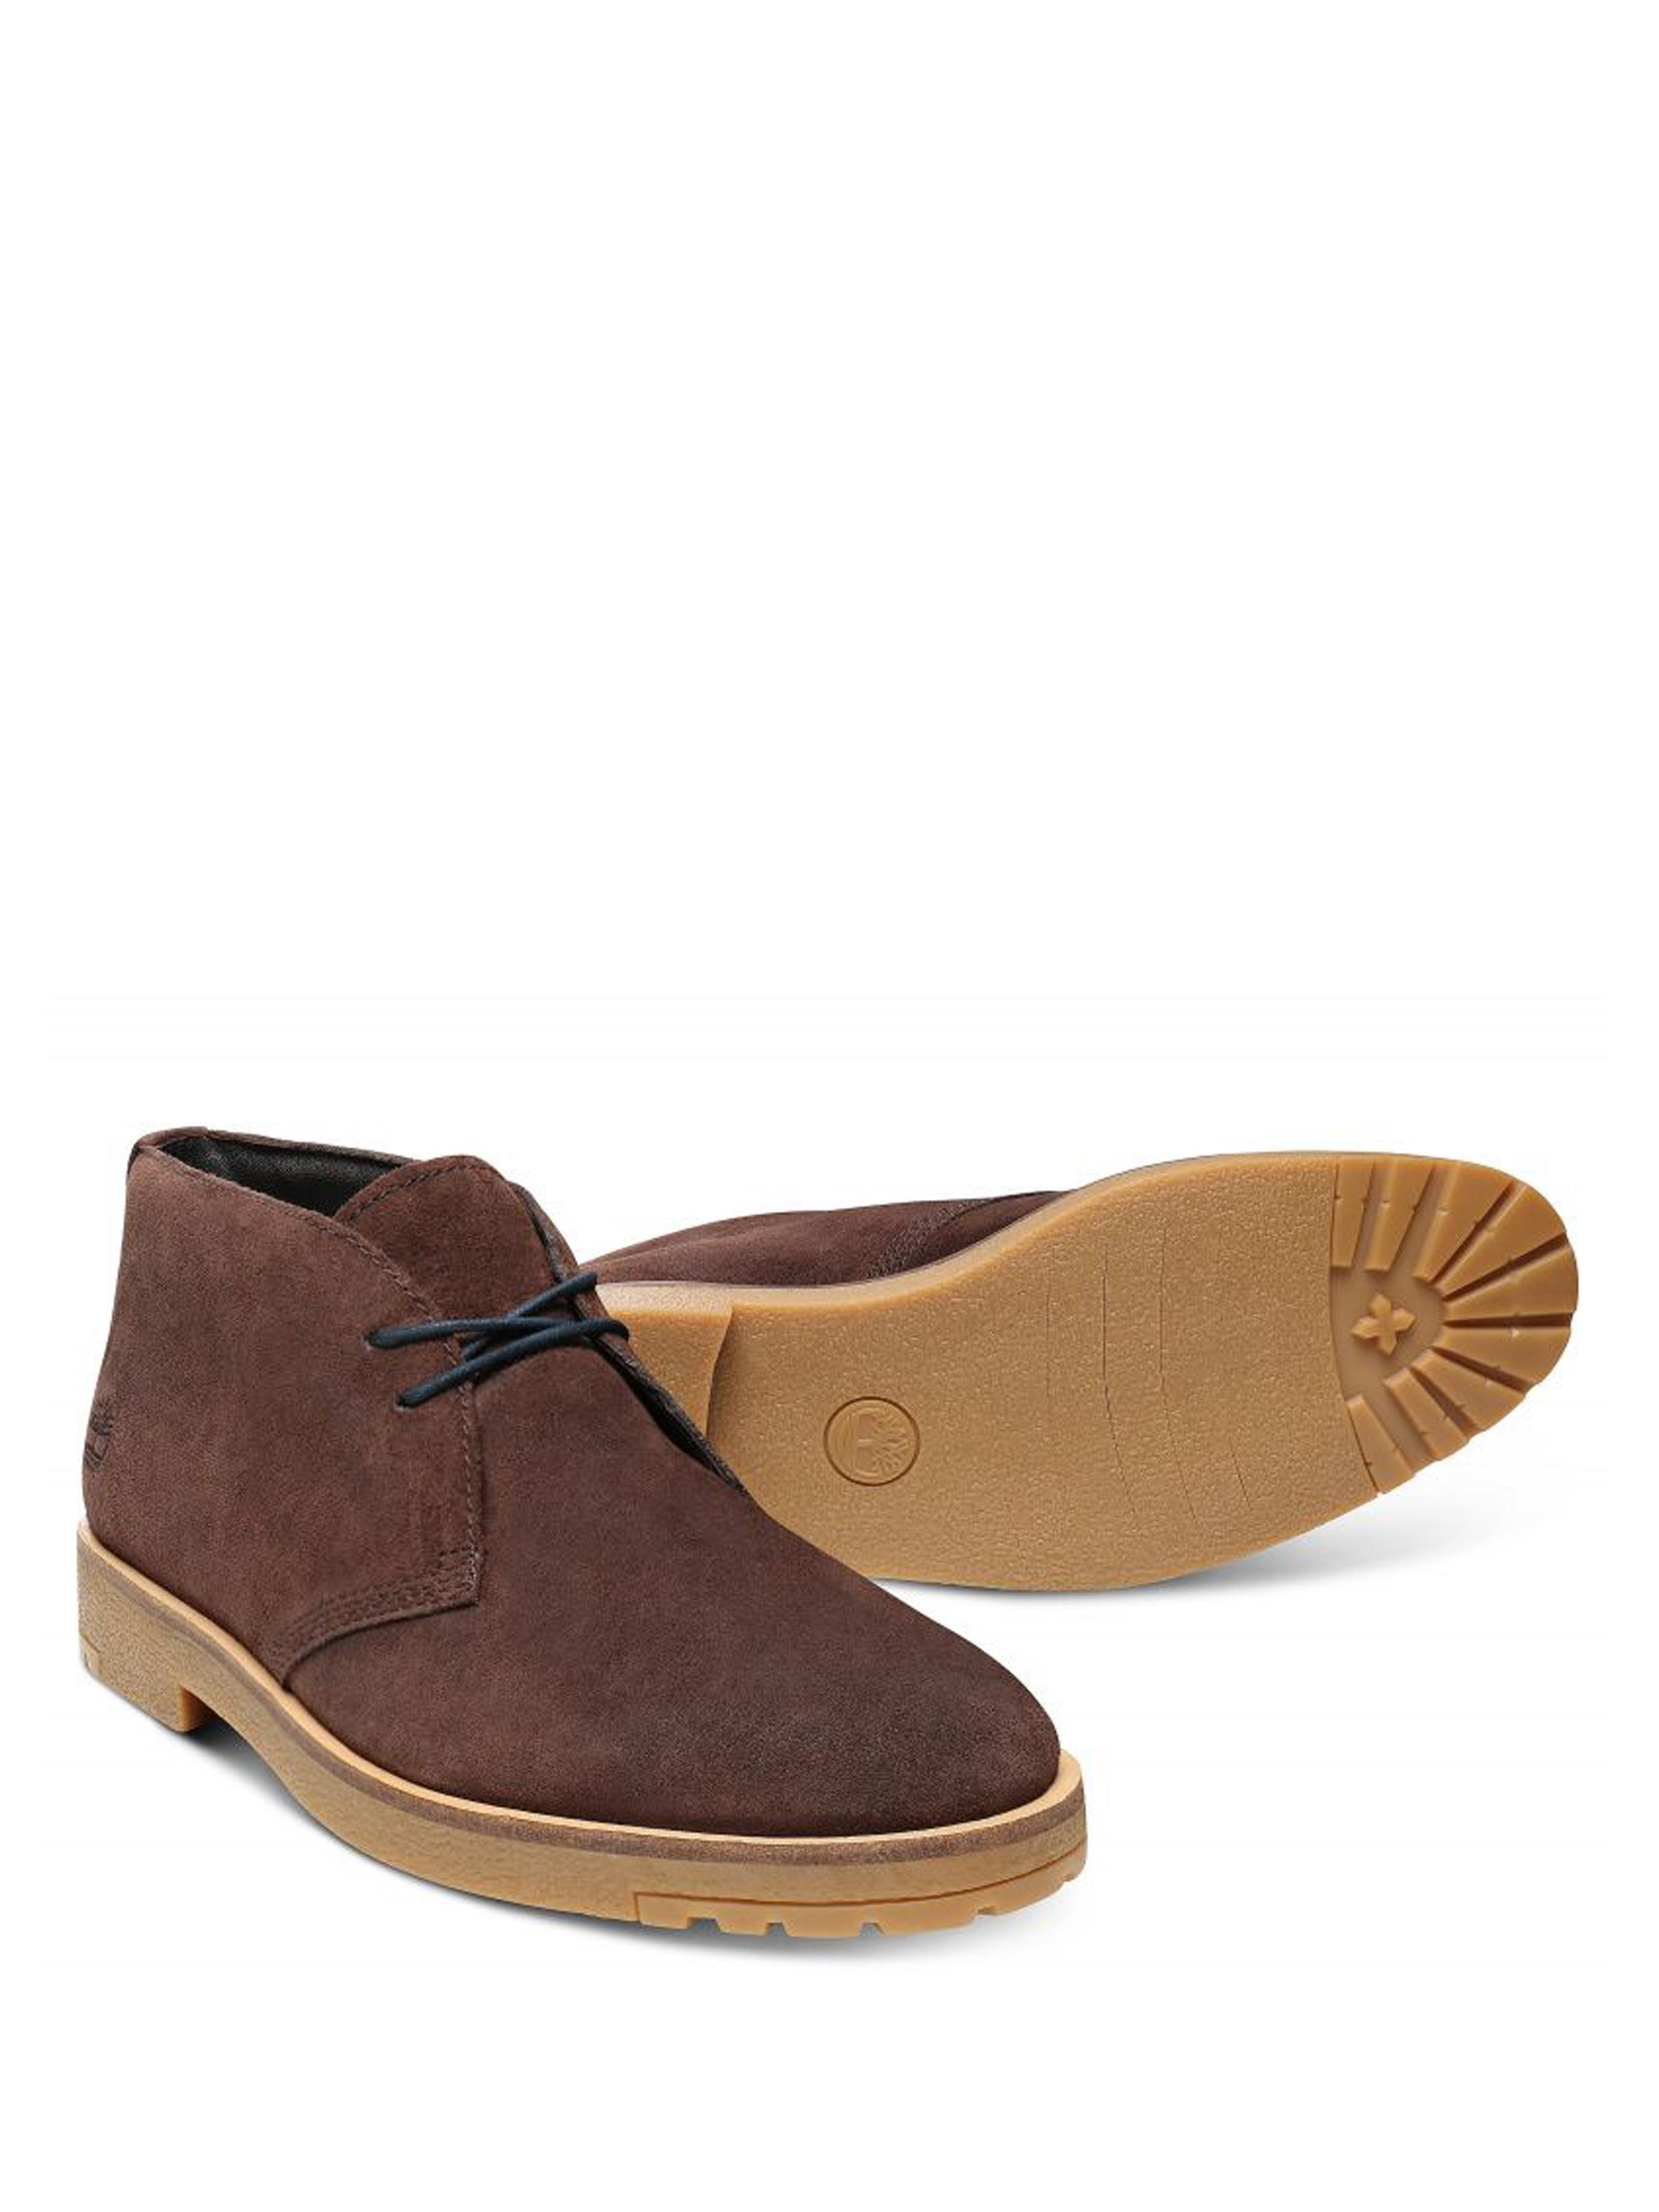 Ботинки для мужчин Timberland Folk Gentleman TF3855 купить в Интертоп, 2017